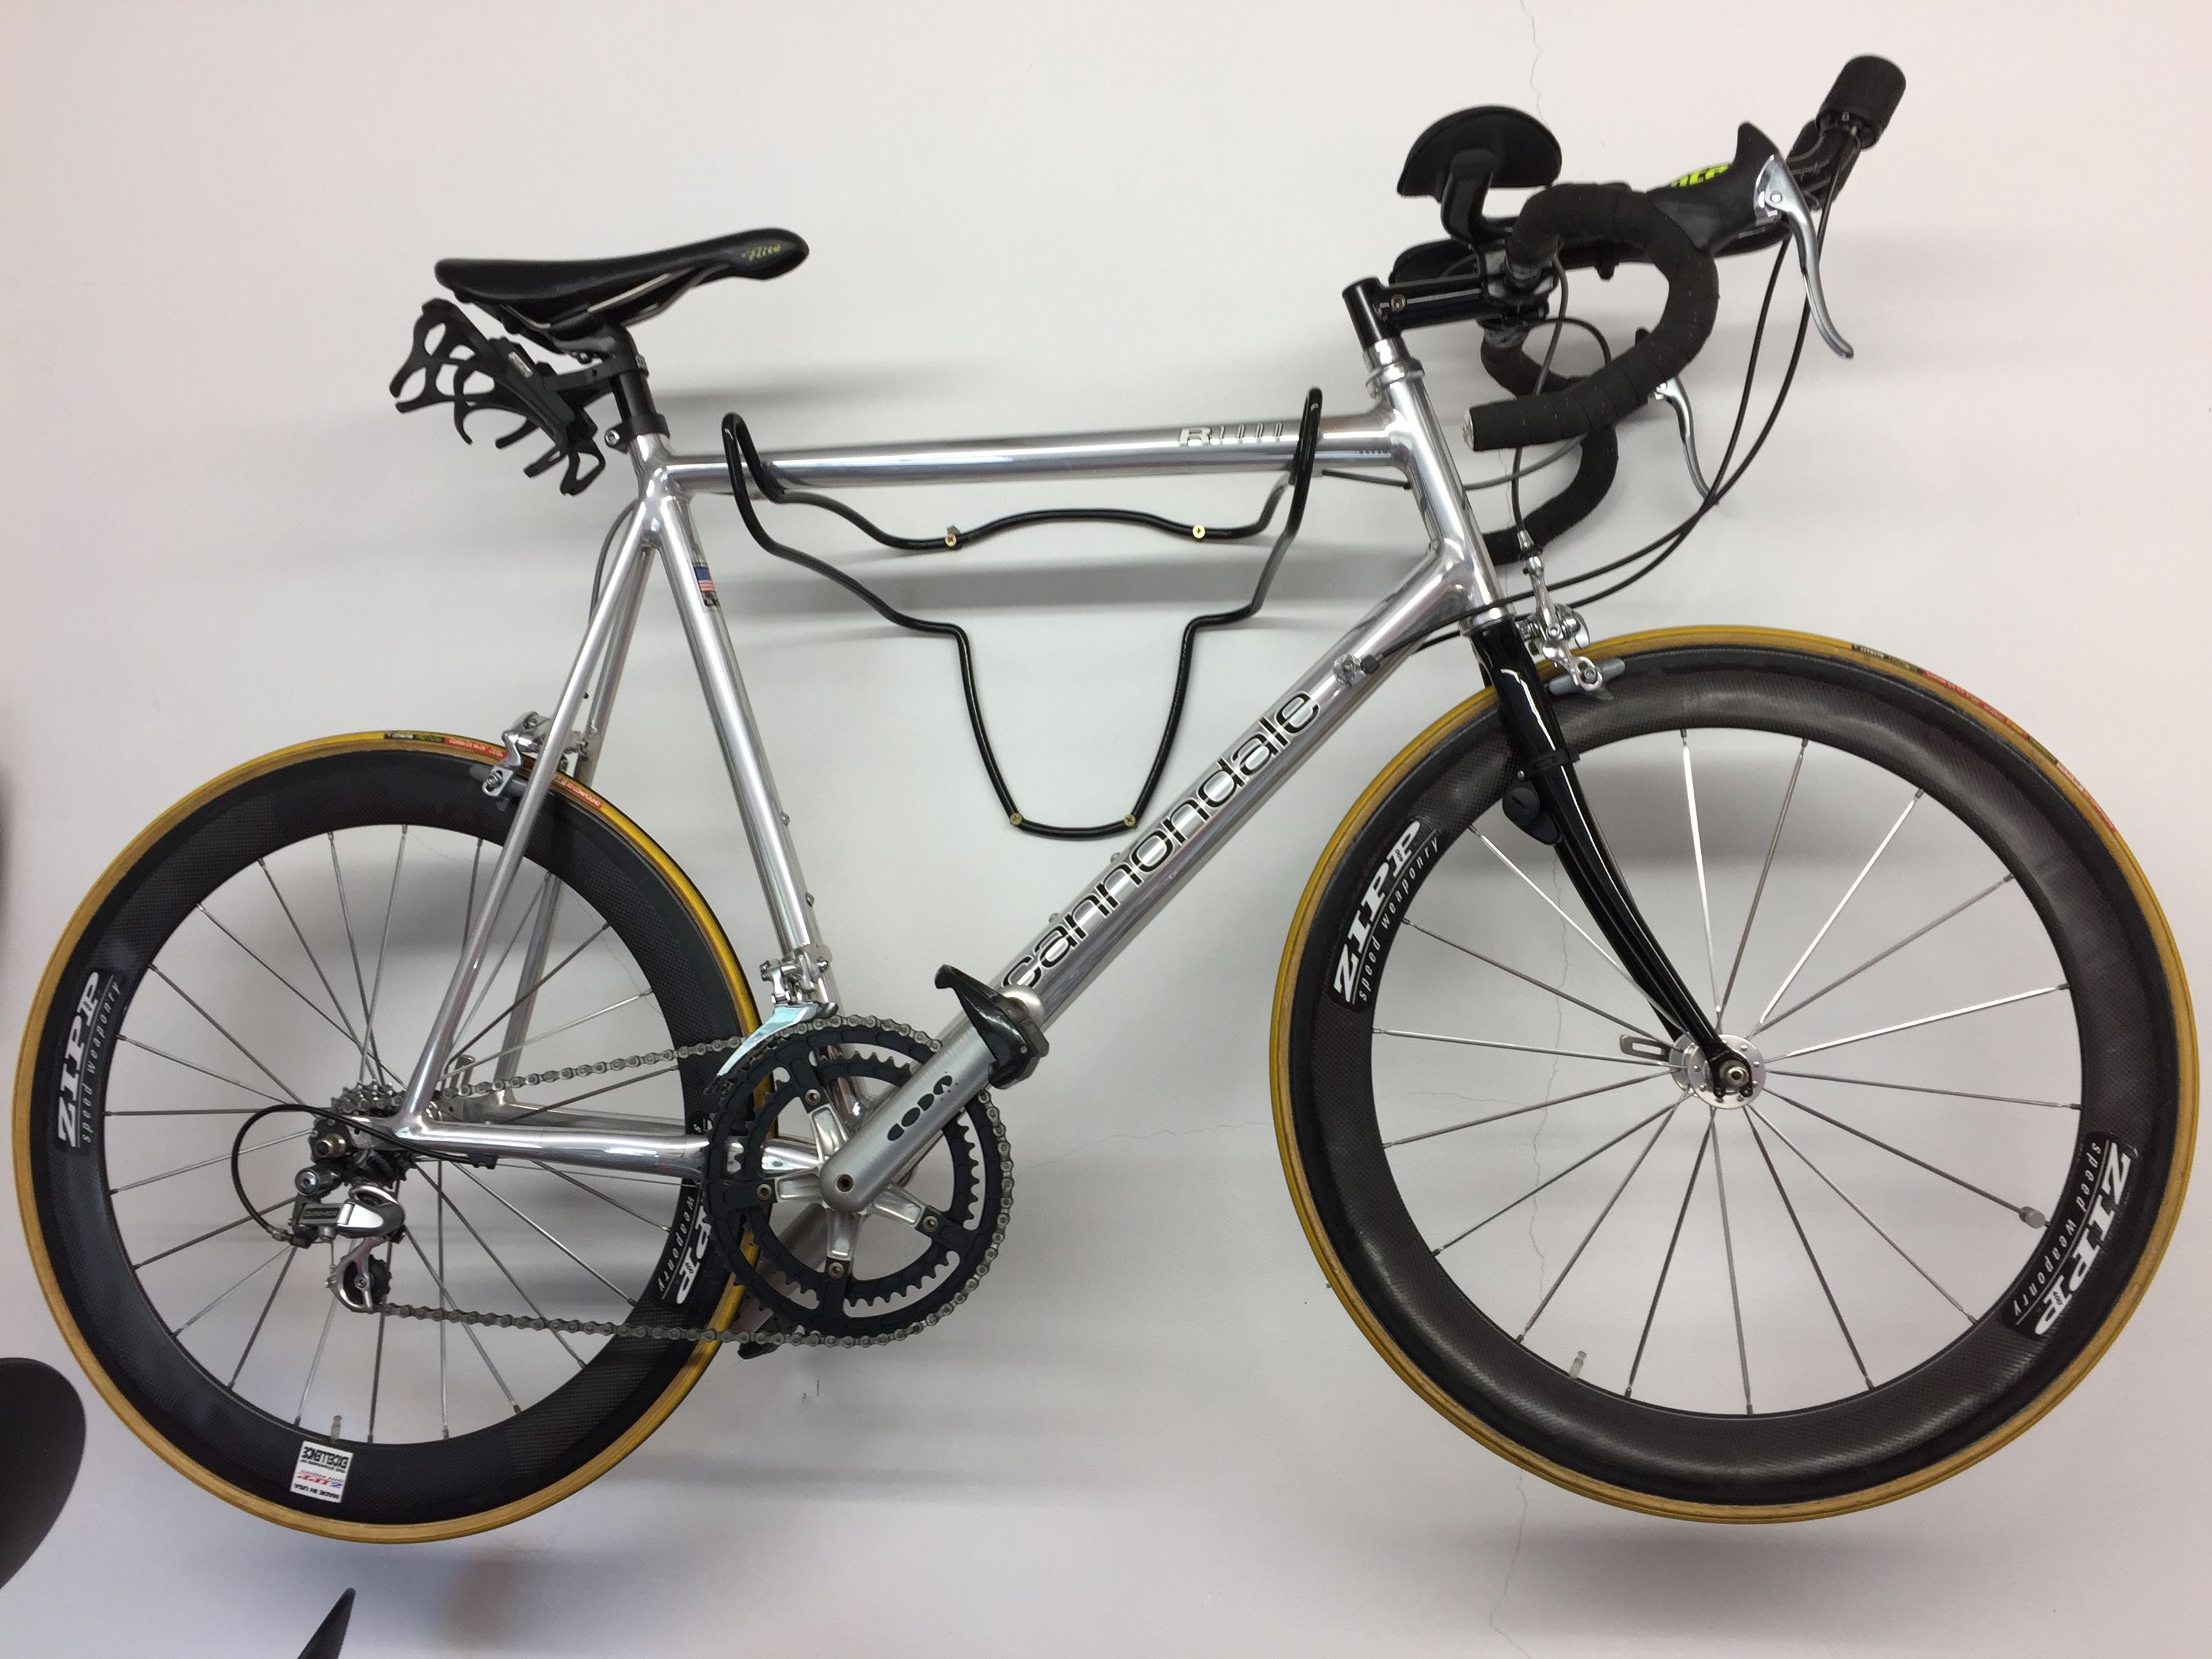 1995 Cannondale R1000 TT bike